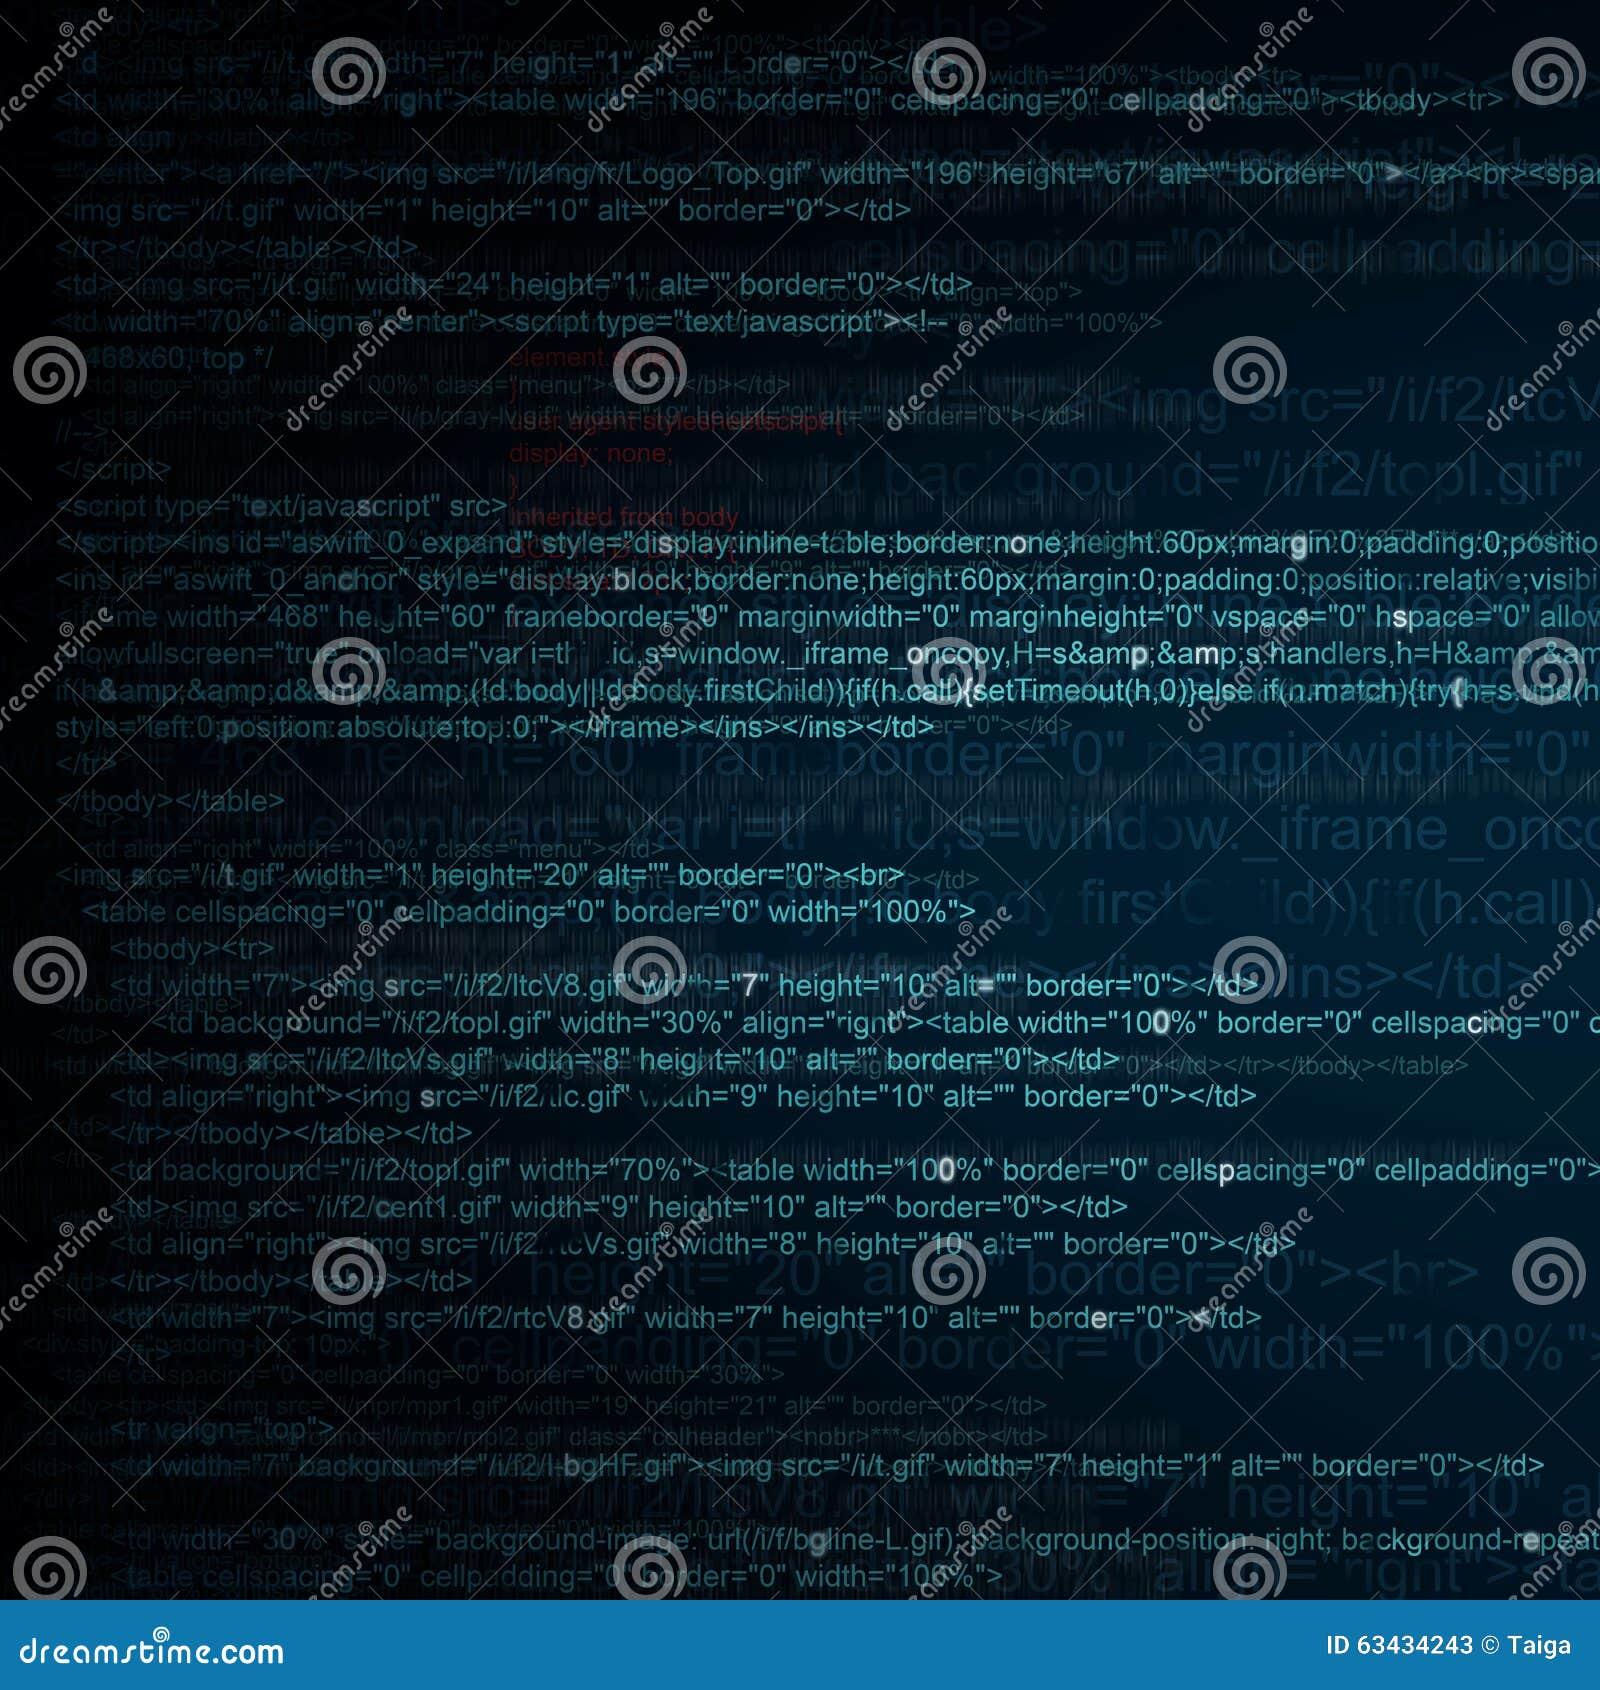 HTML Computer Code Background Stock Photo - Image: 63434243